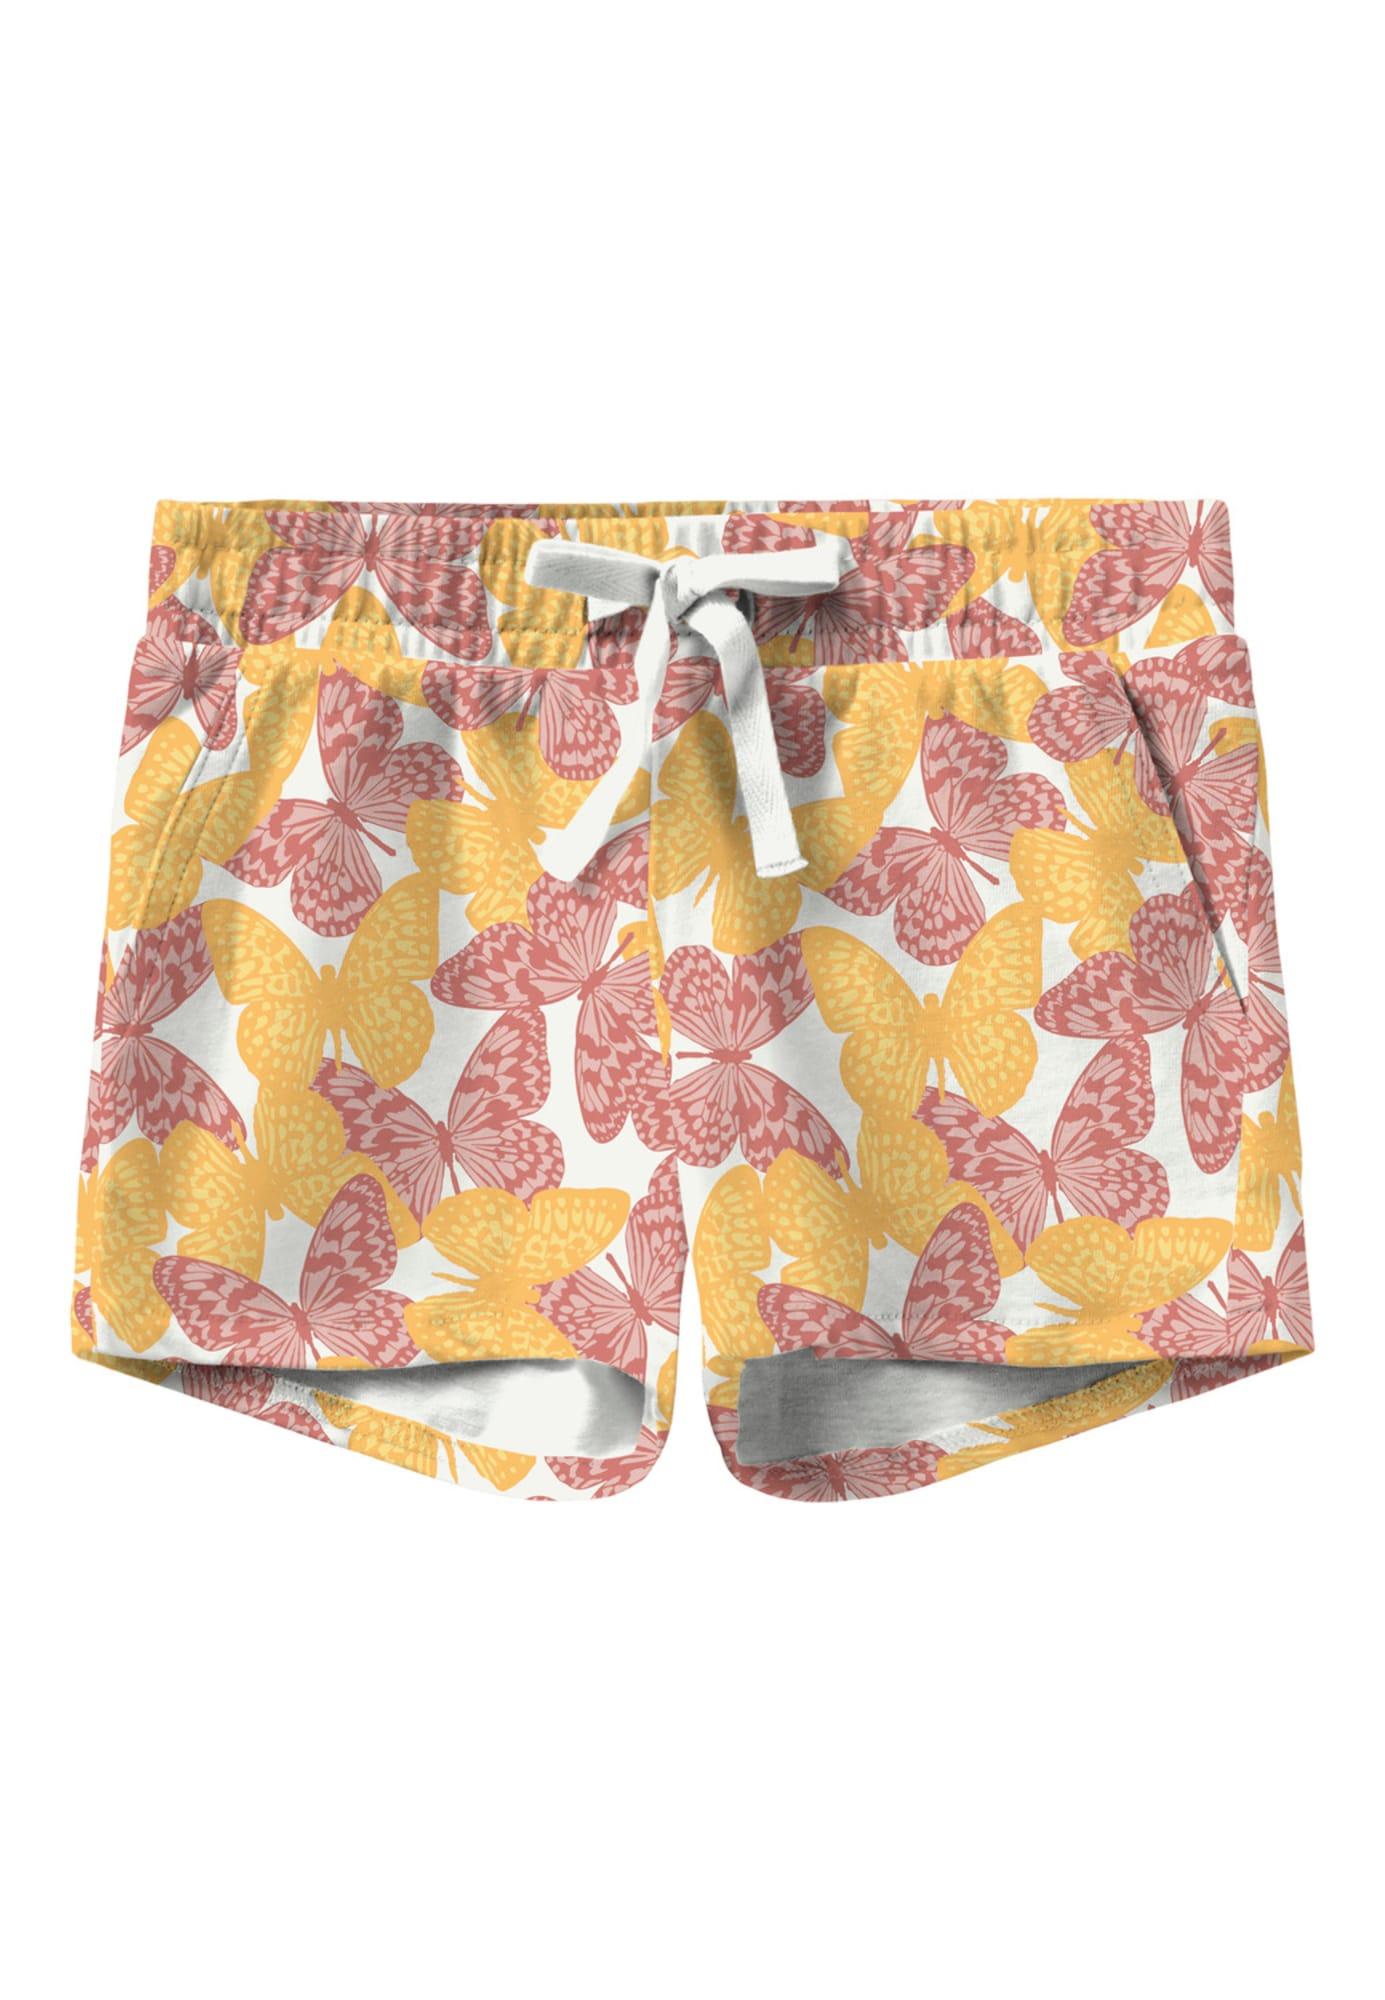 NAME IT Kalhoty 'Vigga'  bílá / žlutá / burgundská červeň